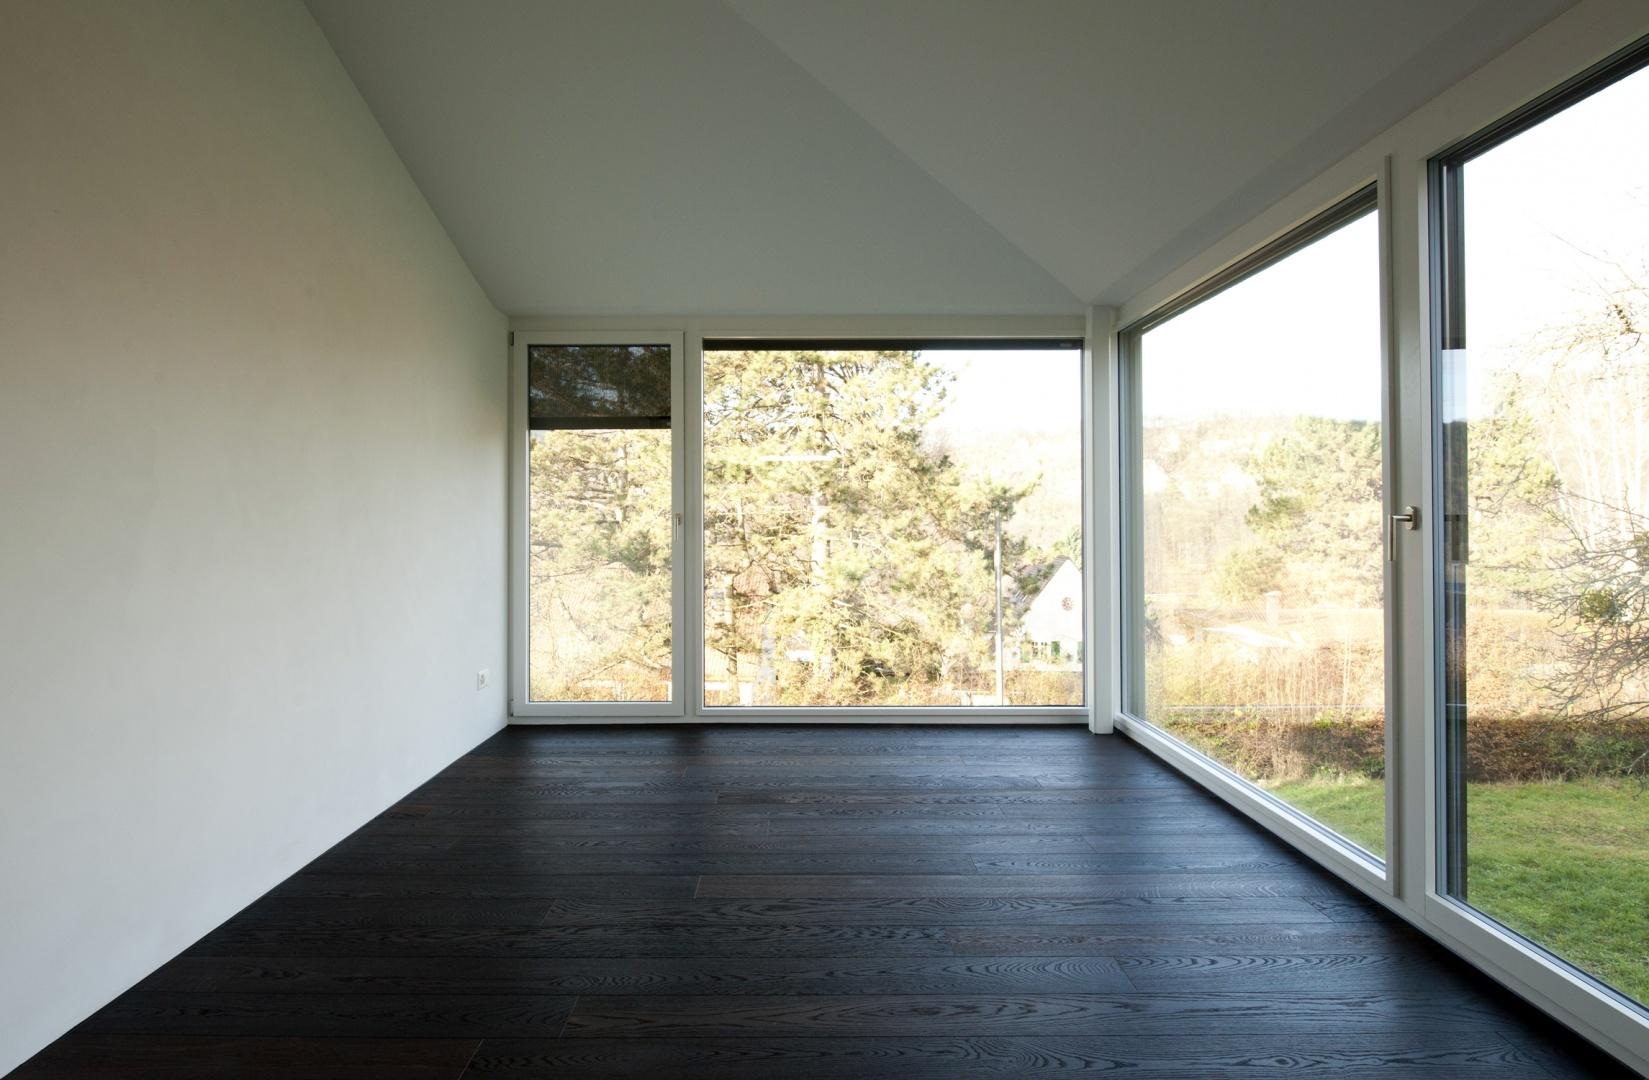 Elternschlafzimmer © Juho Nyberg Architektur GmbH, Forchstrasse 30, 8008 Zürich